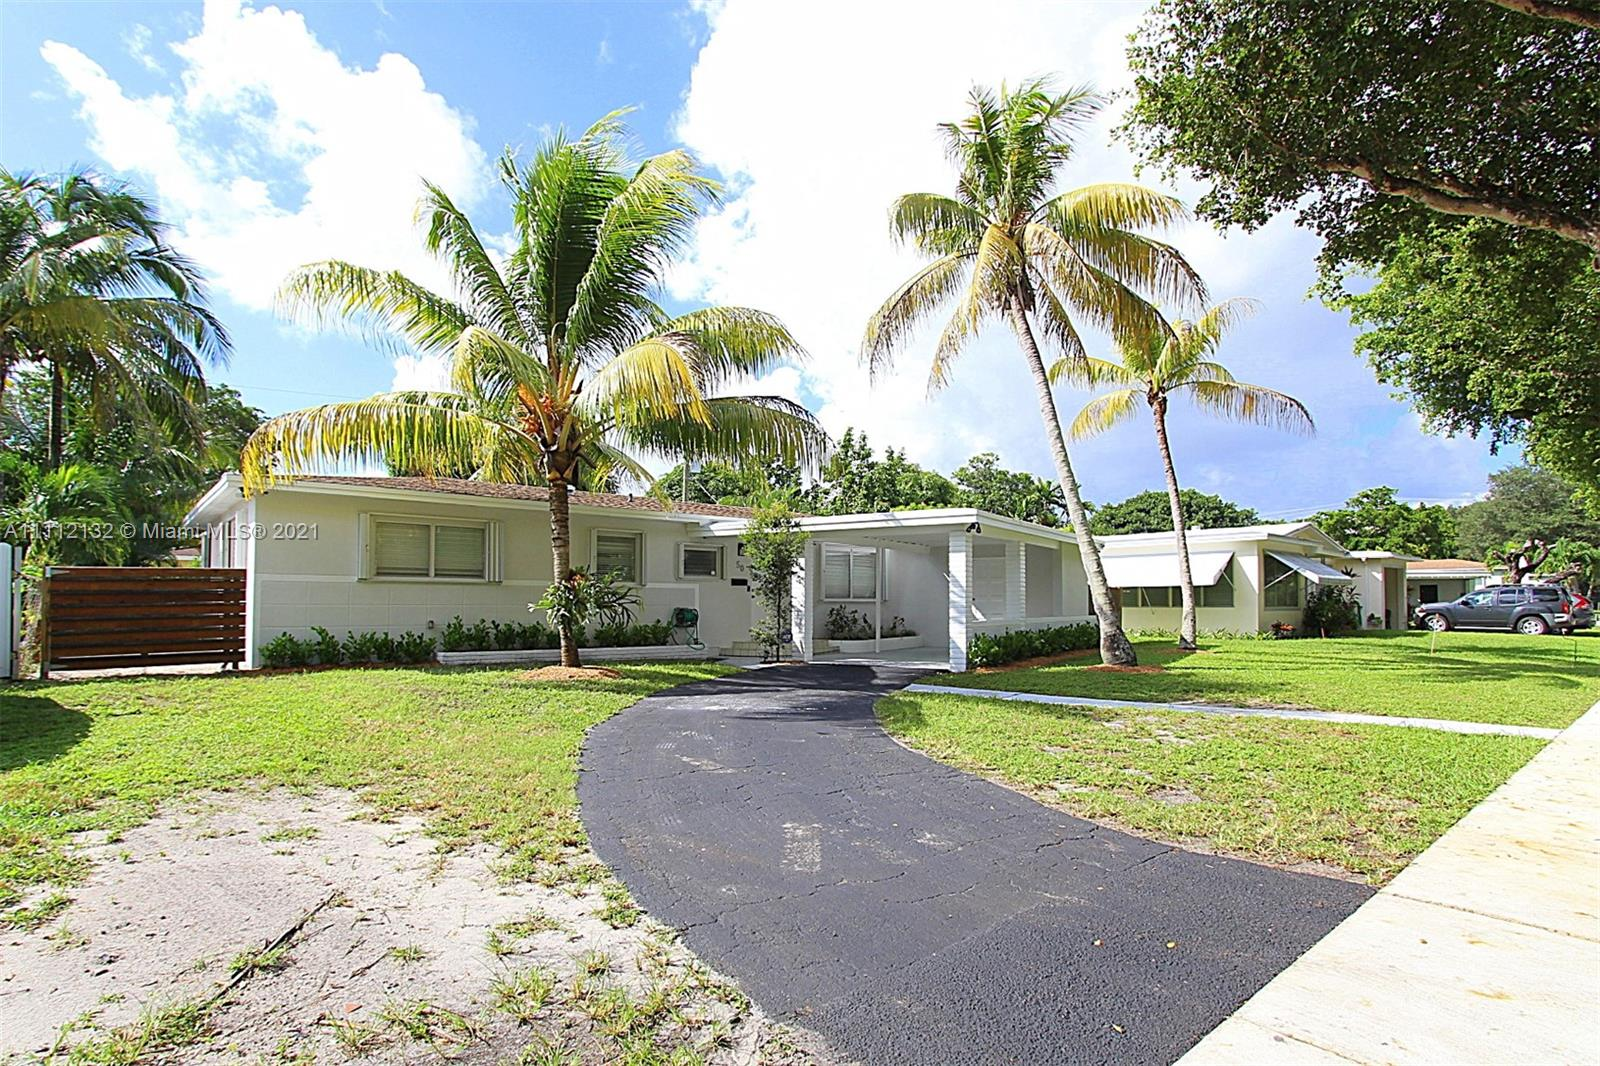 Single Family Home,For Sale,50 NE 131st St, North Miami, Florida 33161,Brickell,realty,broker,condos near me